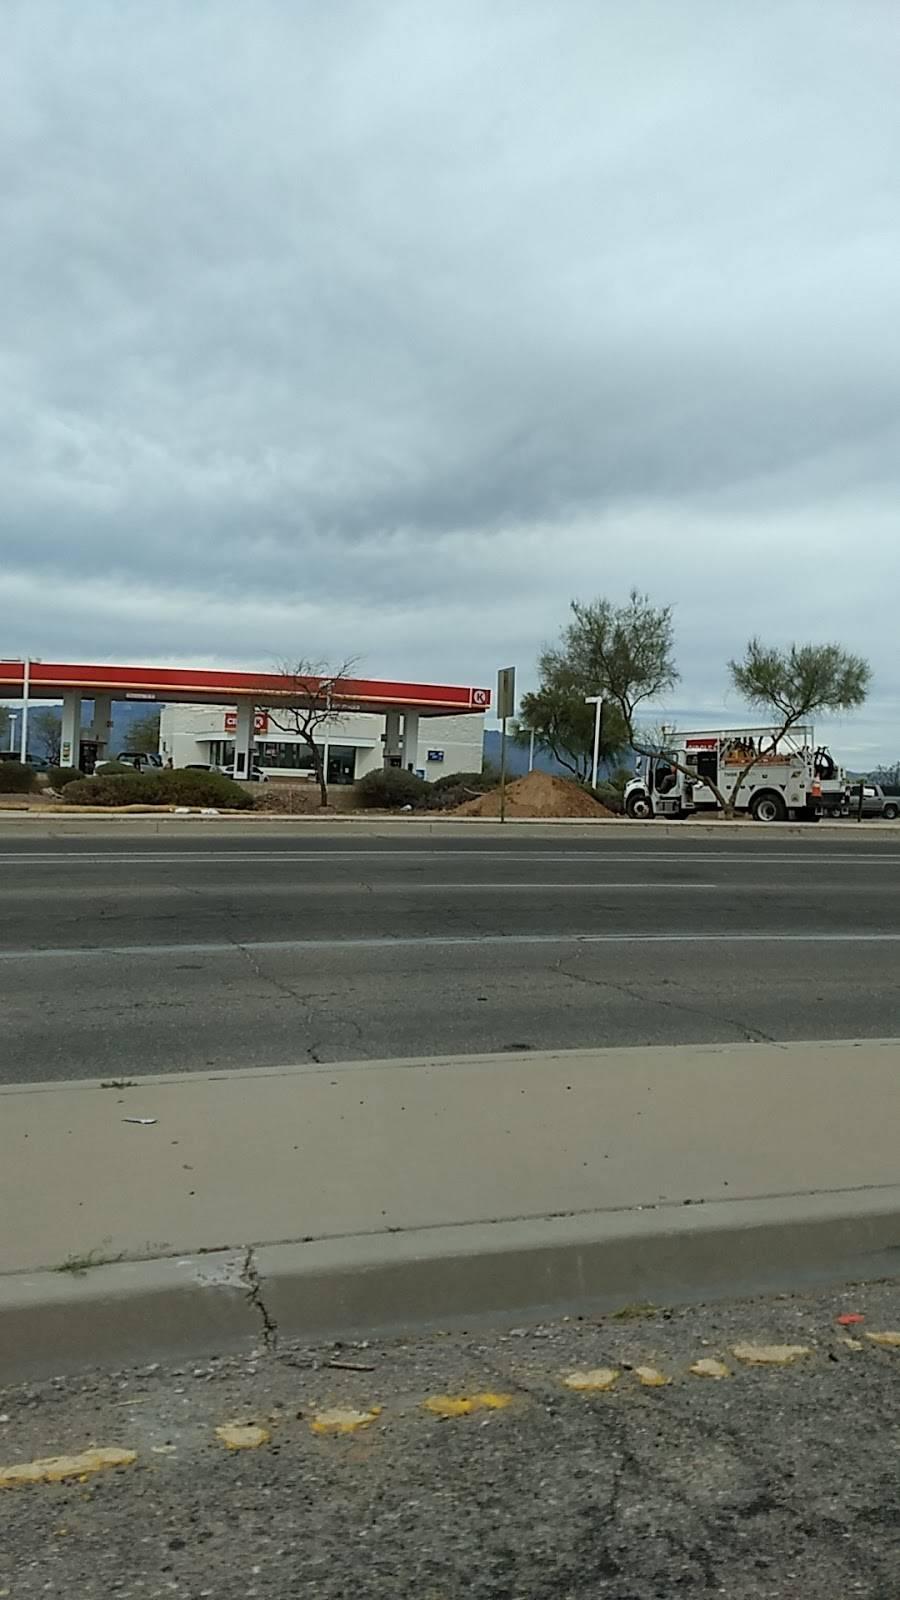 Circle K - gas station  | Photo 2 of 2 | Address: 6175 S Kolb Rd, Tucson, AZ 85756, USA | Phone: (520) 663-1686